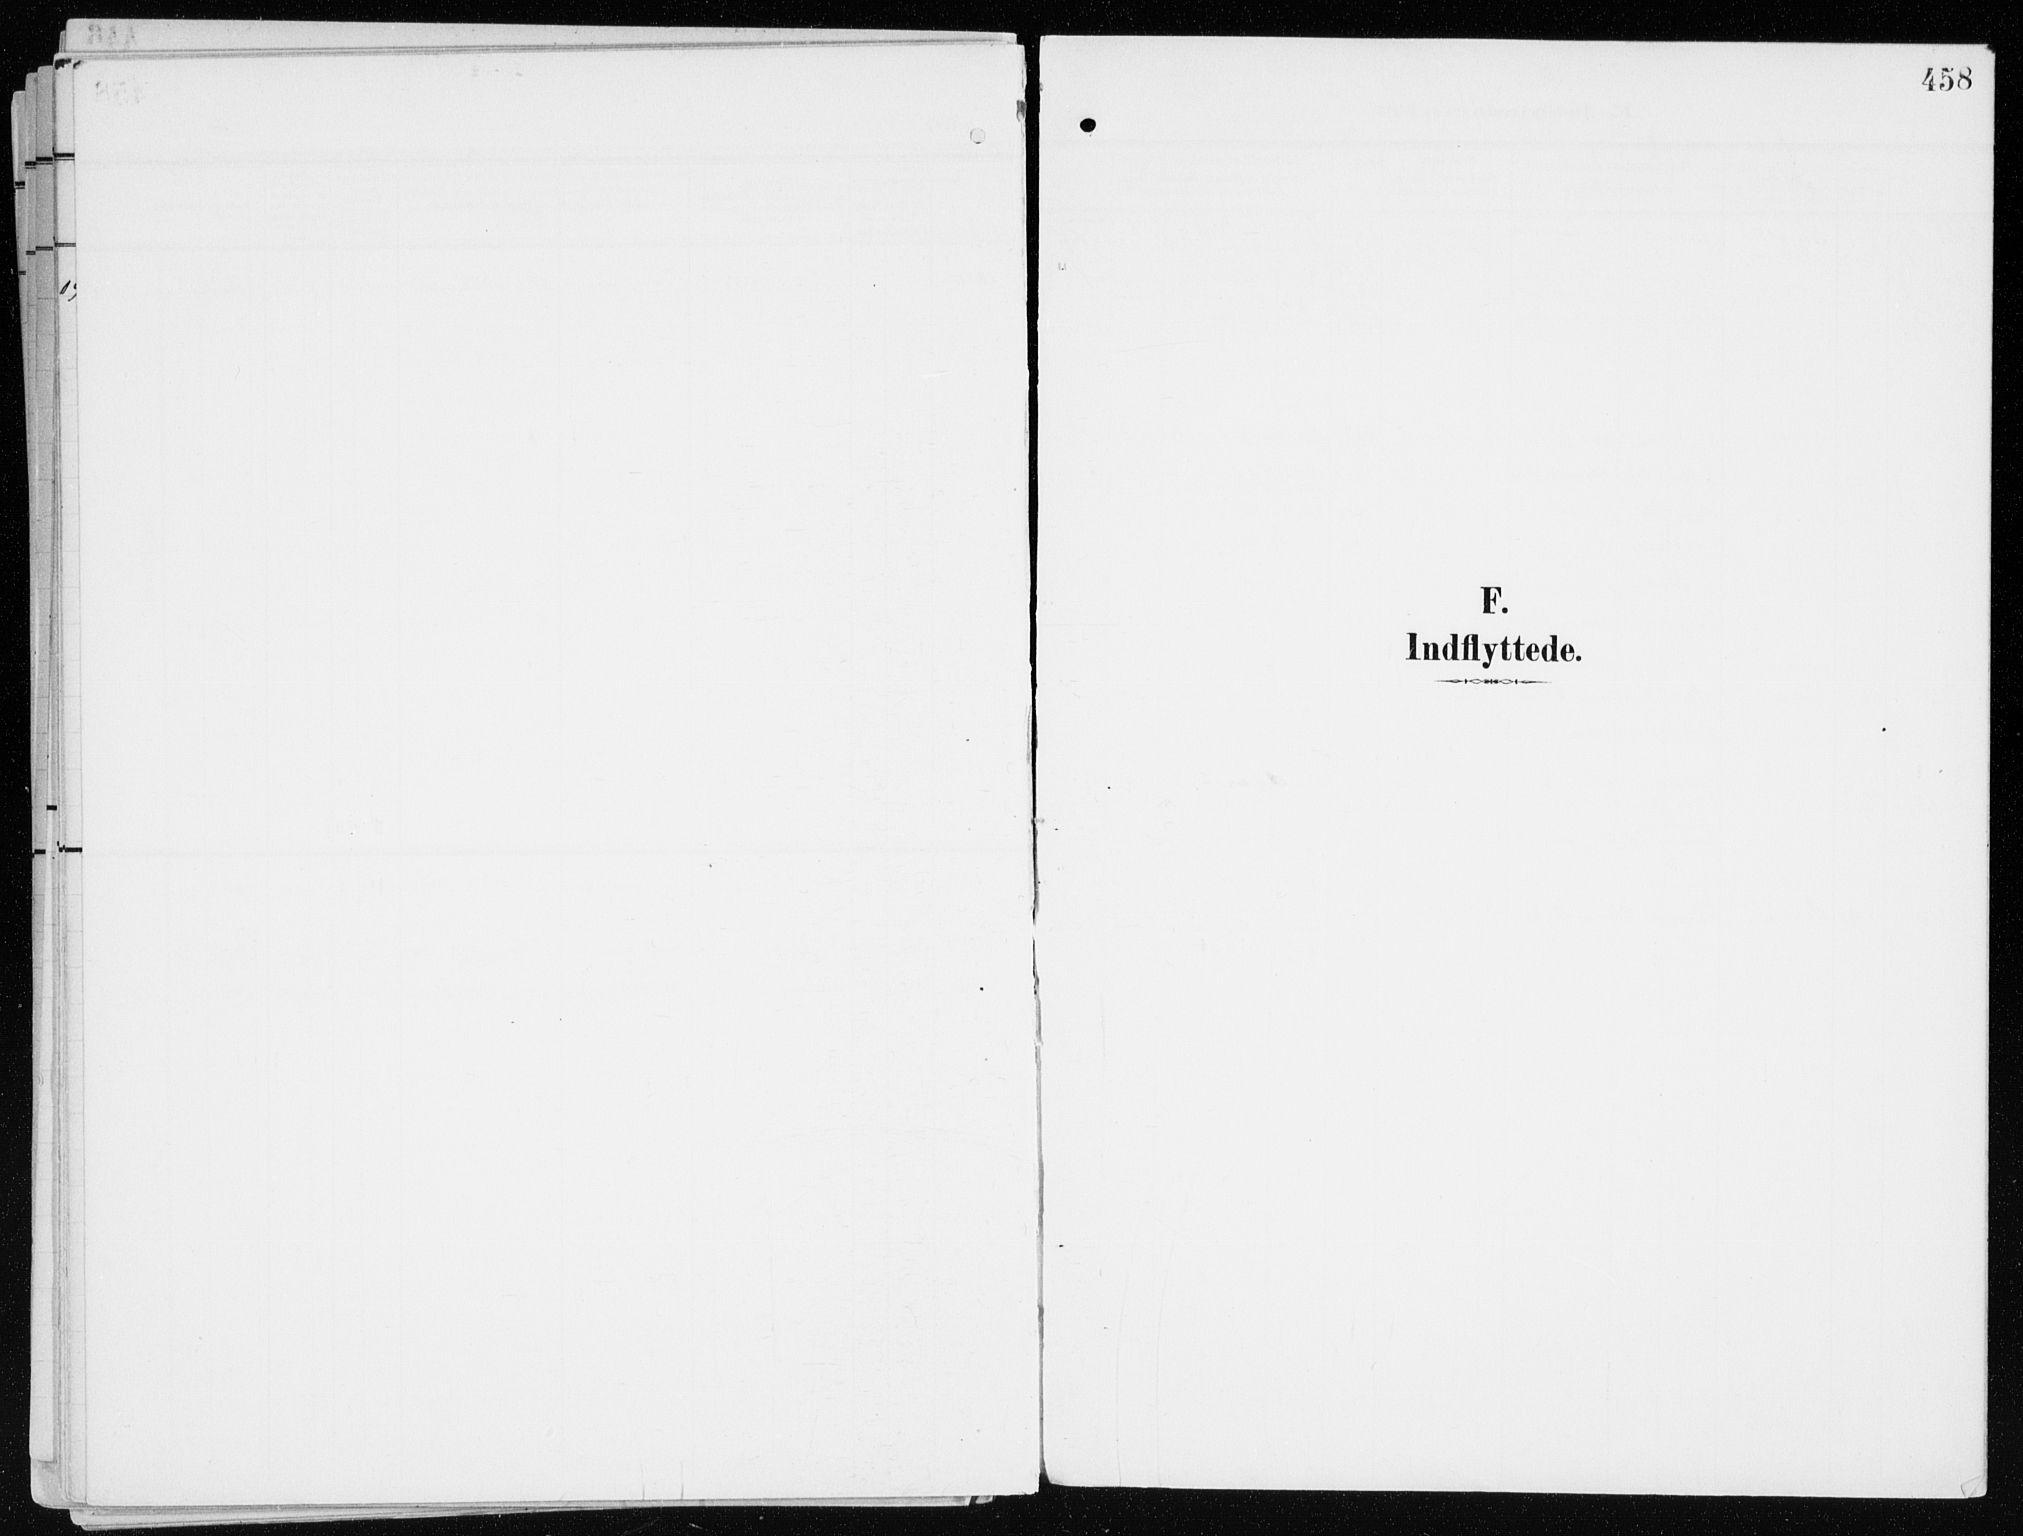 SAH, Furnes prestekontor, K/Ka/L0001: Ministerialbok nr. 1, 1907-1935, s. 458